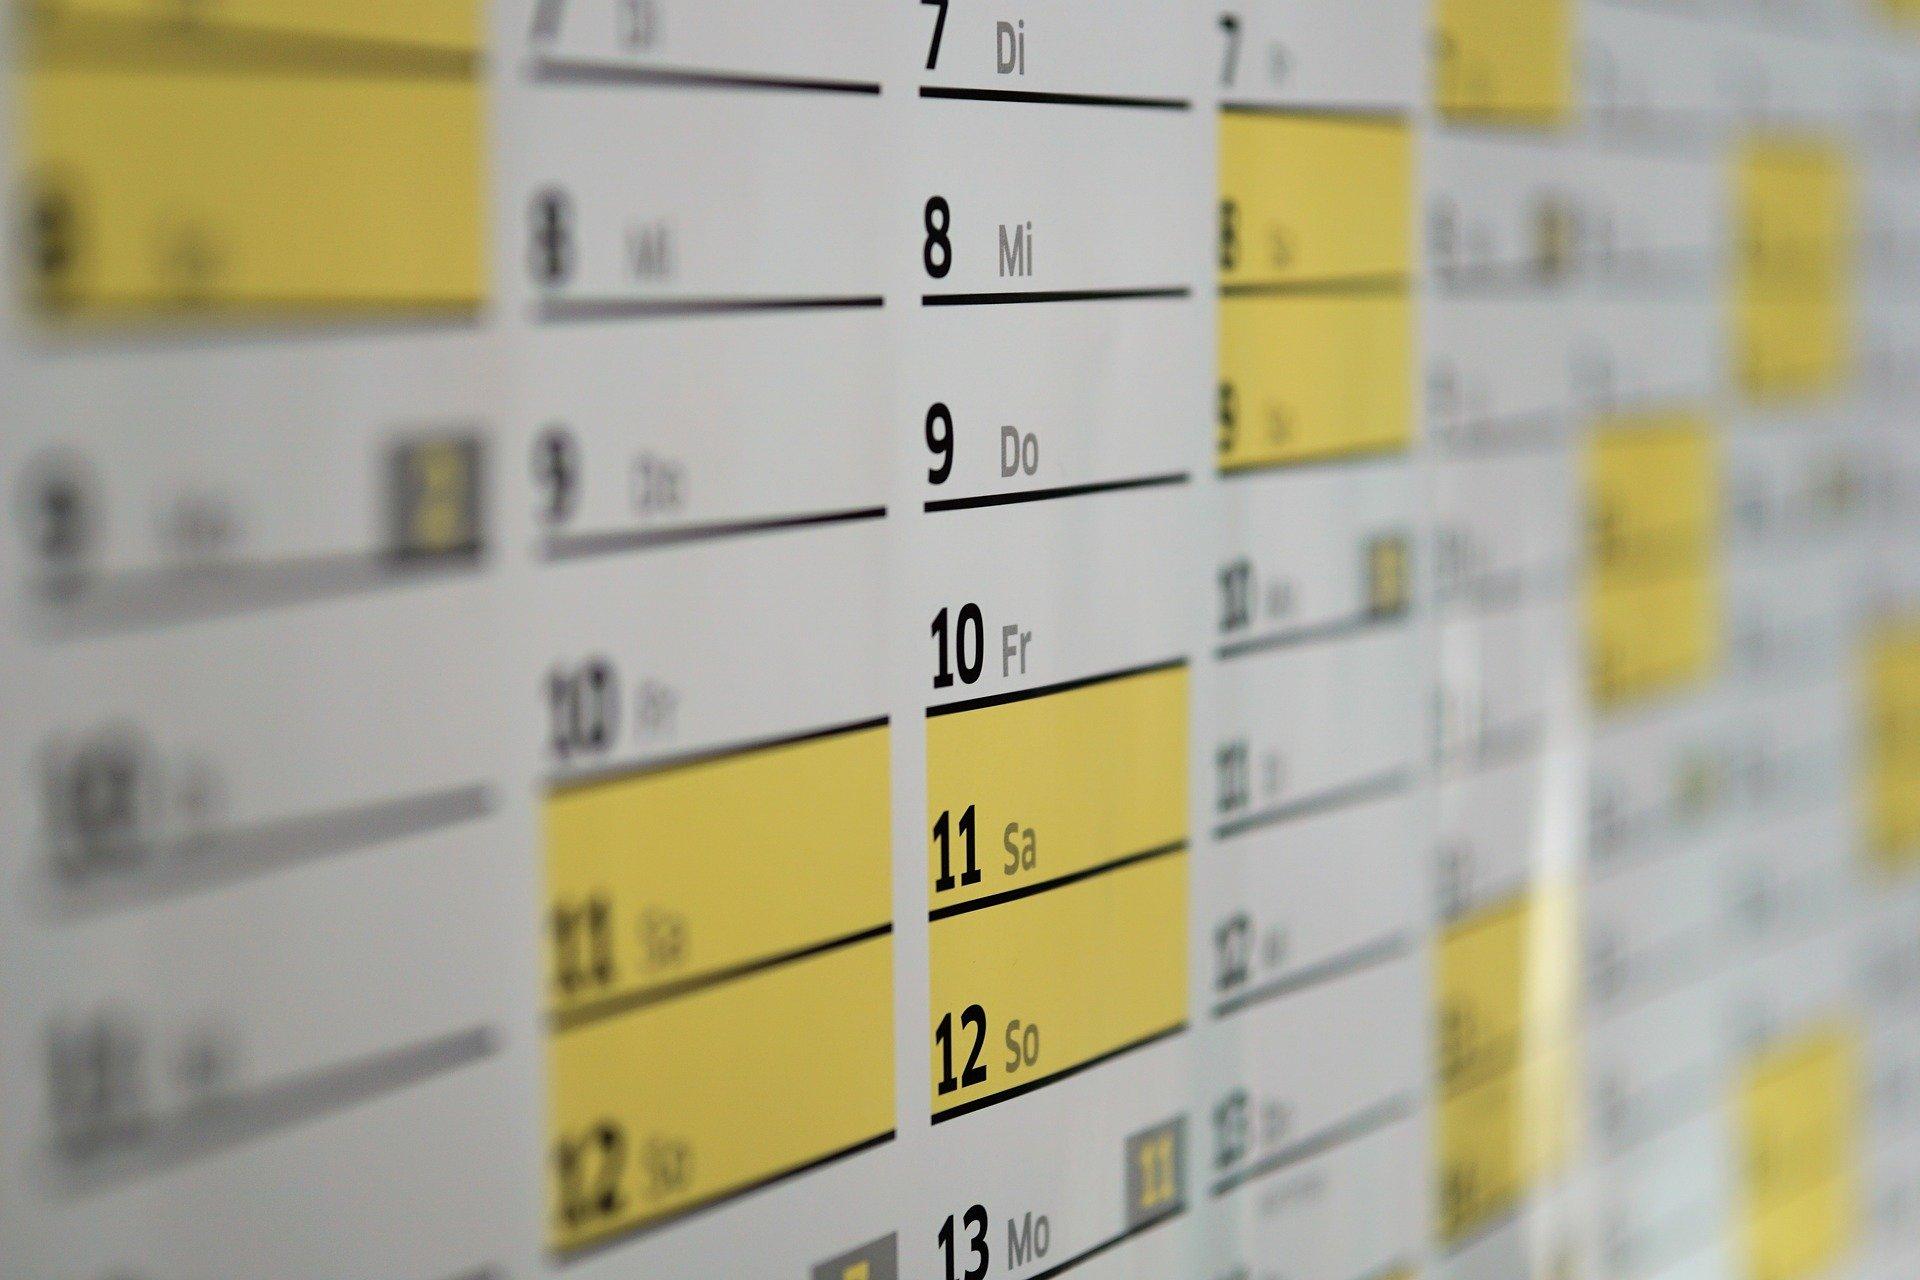 Kalender als Visual für Terminplanung